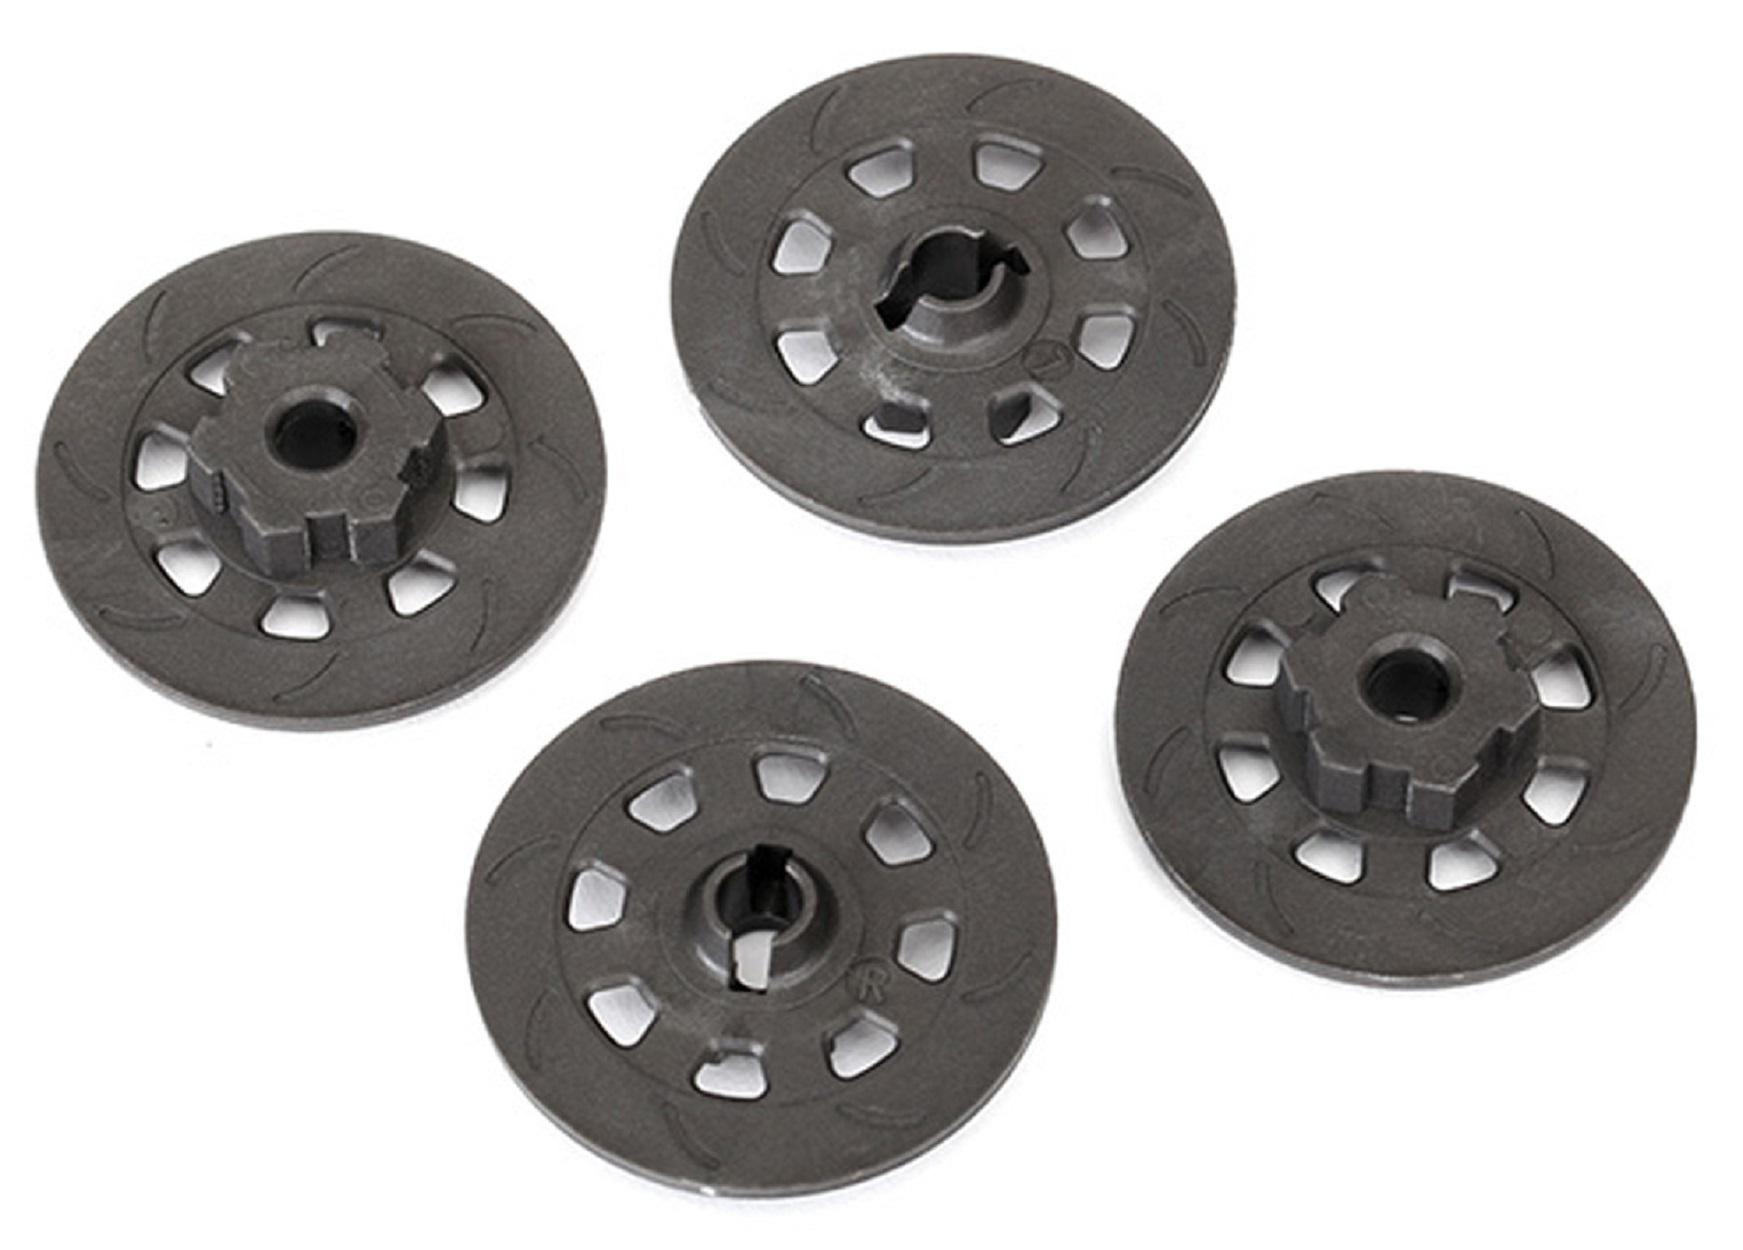 4954R Traxxas R//C Radio Controlled Car Spare Parts Wheel Hubs Hex Steel Black